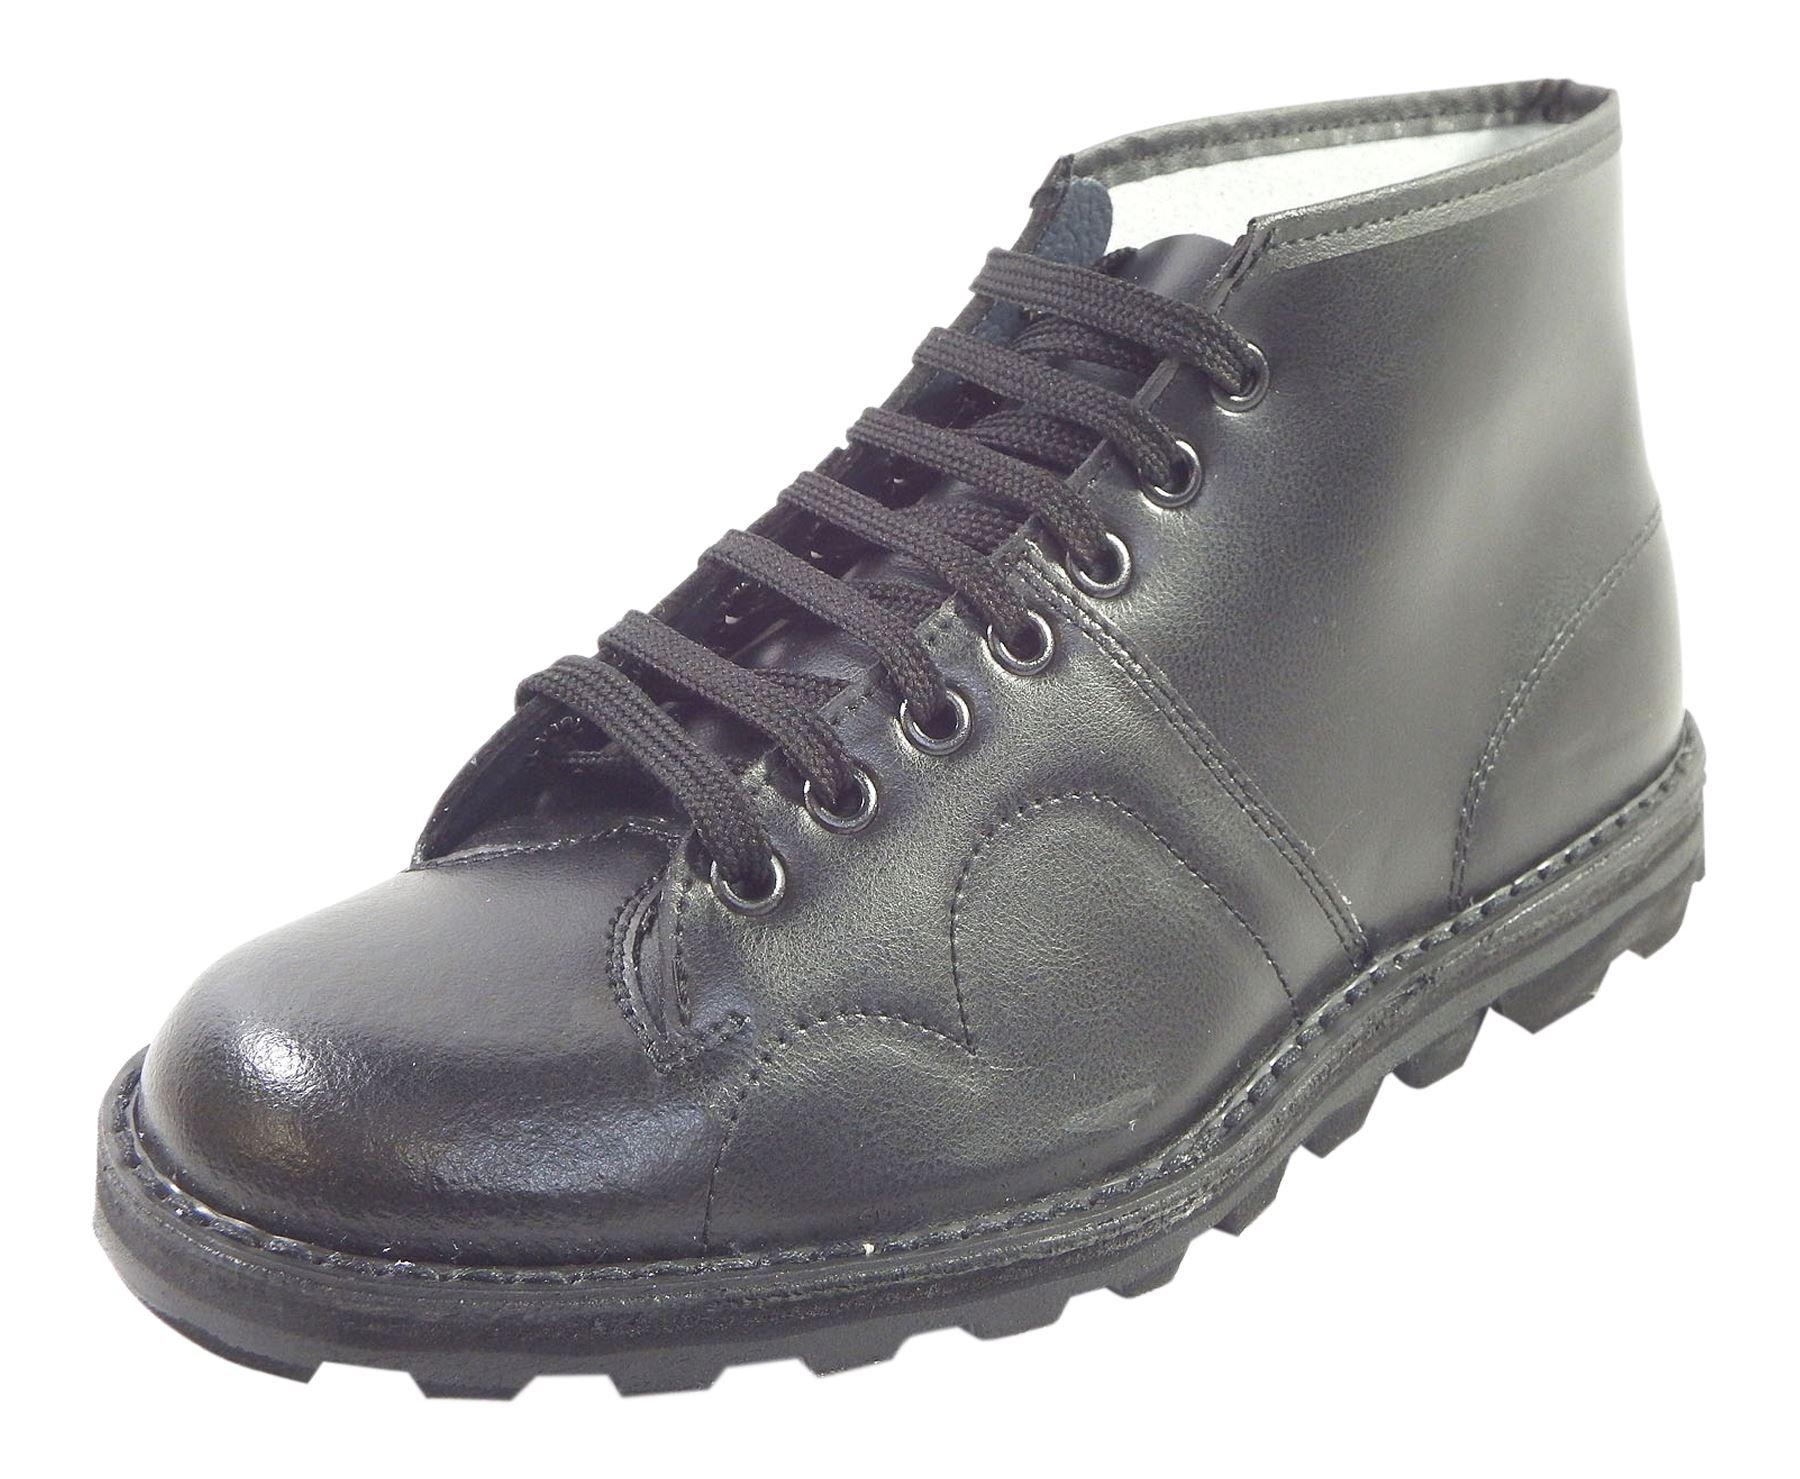 a9114ff018d Grafters Ladies / Mens Original Retro Monkey Boots | website